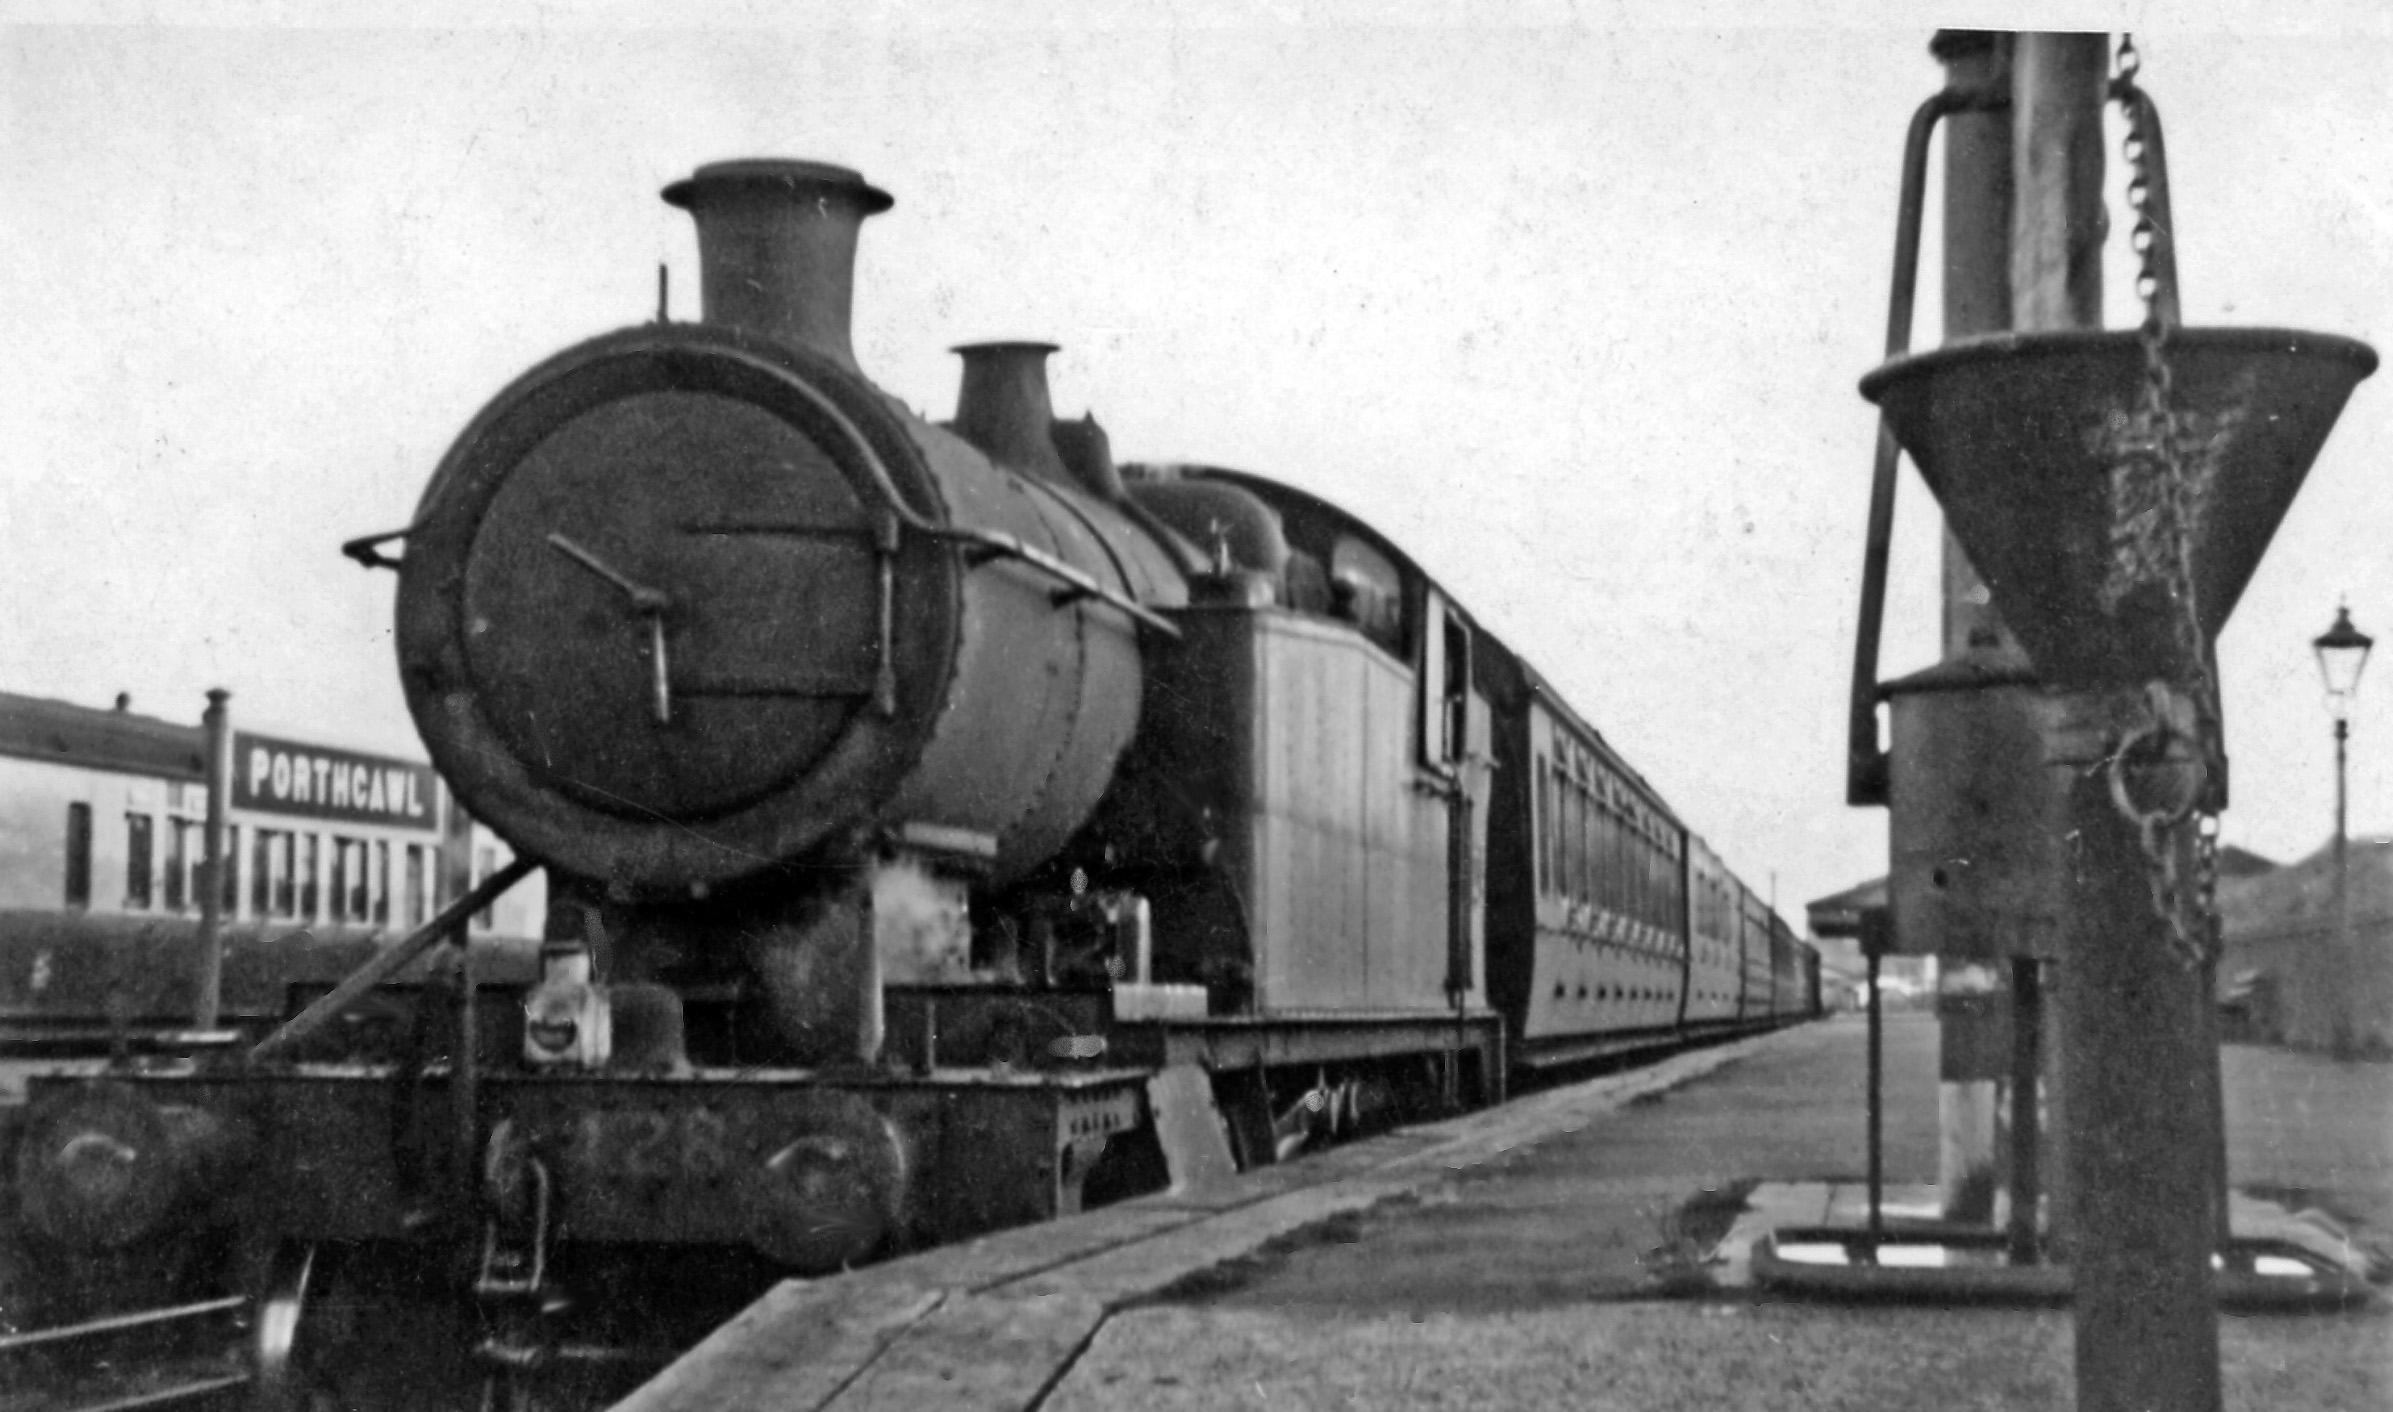 Porthcawl Railway Station Photo Great Western Railway. Pyle and Tondu Line 3